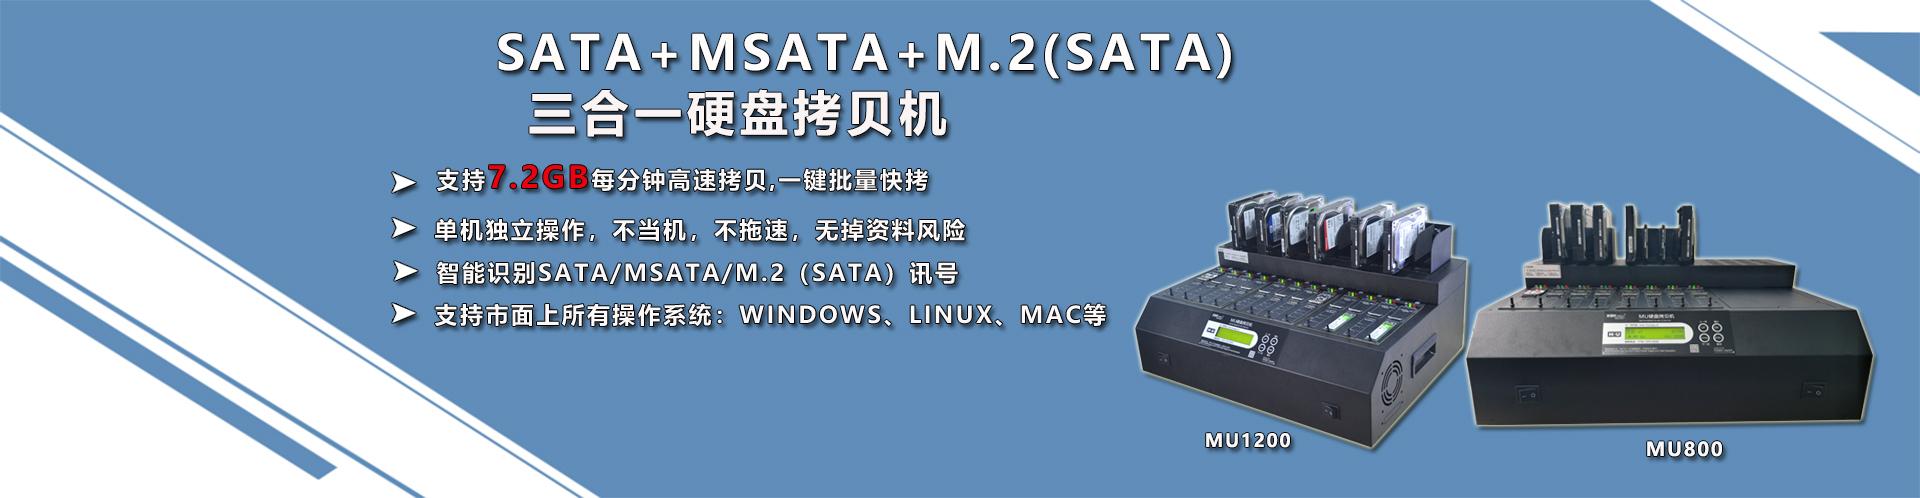 SATA+MSATA+M.2(SATA)三合一硬盘拷贝机